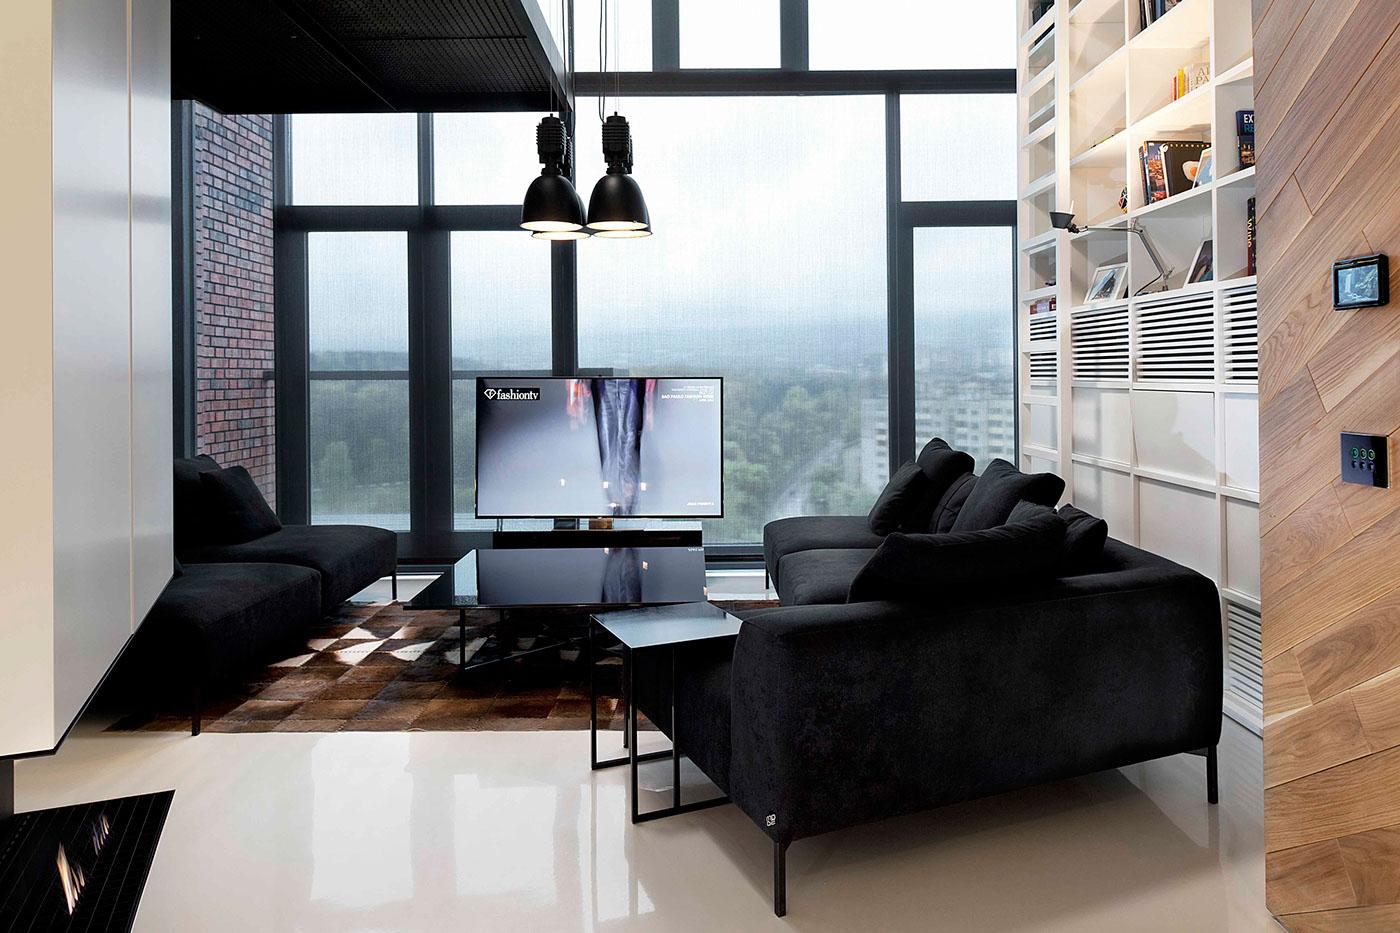 studio mode1 Loft Apartment By Studio Mode